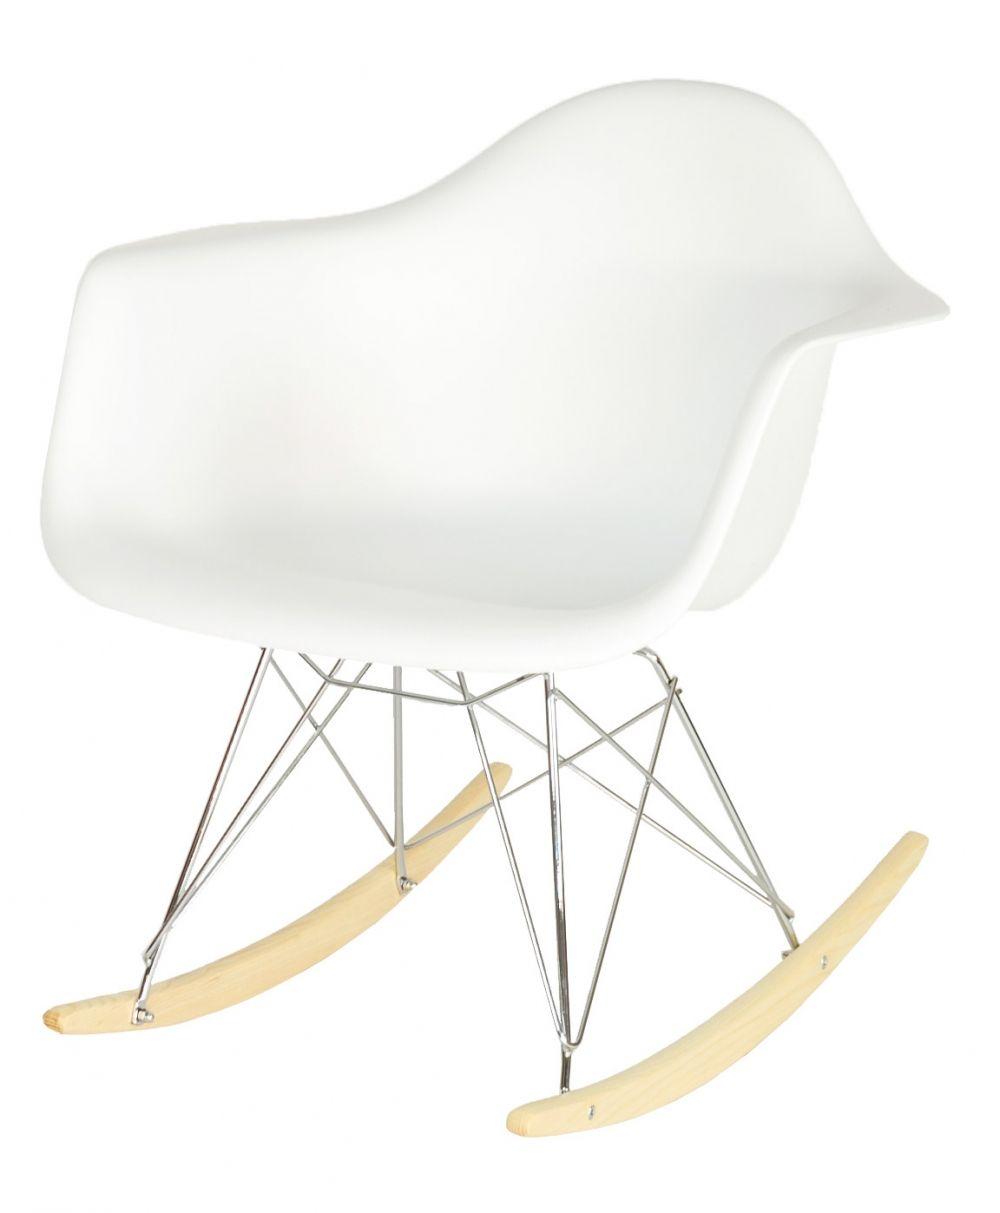 Fauteuil RAR Charles Eames Fauteuils Design Meubles Design - Fauteuil design charles eames